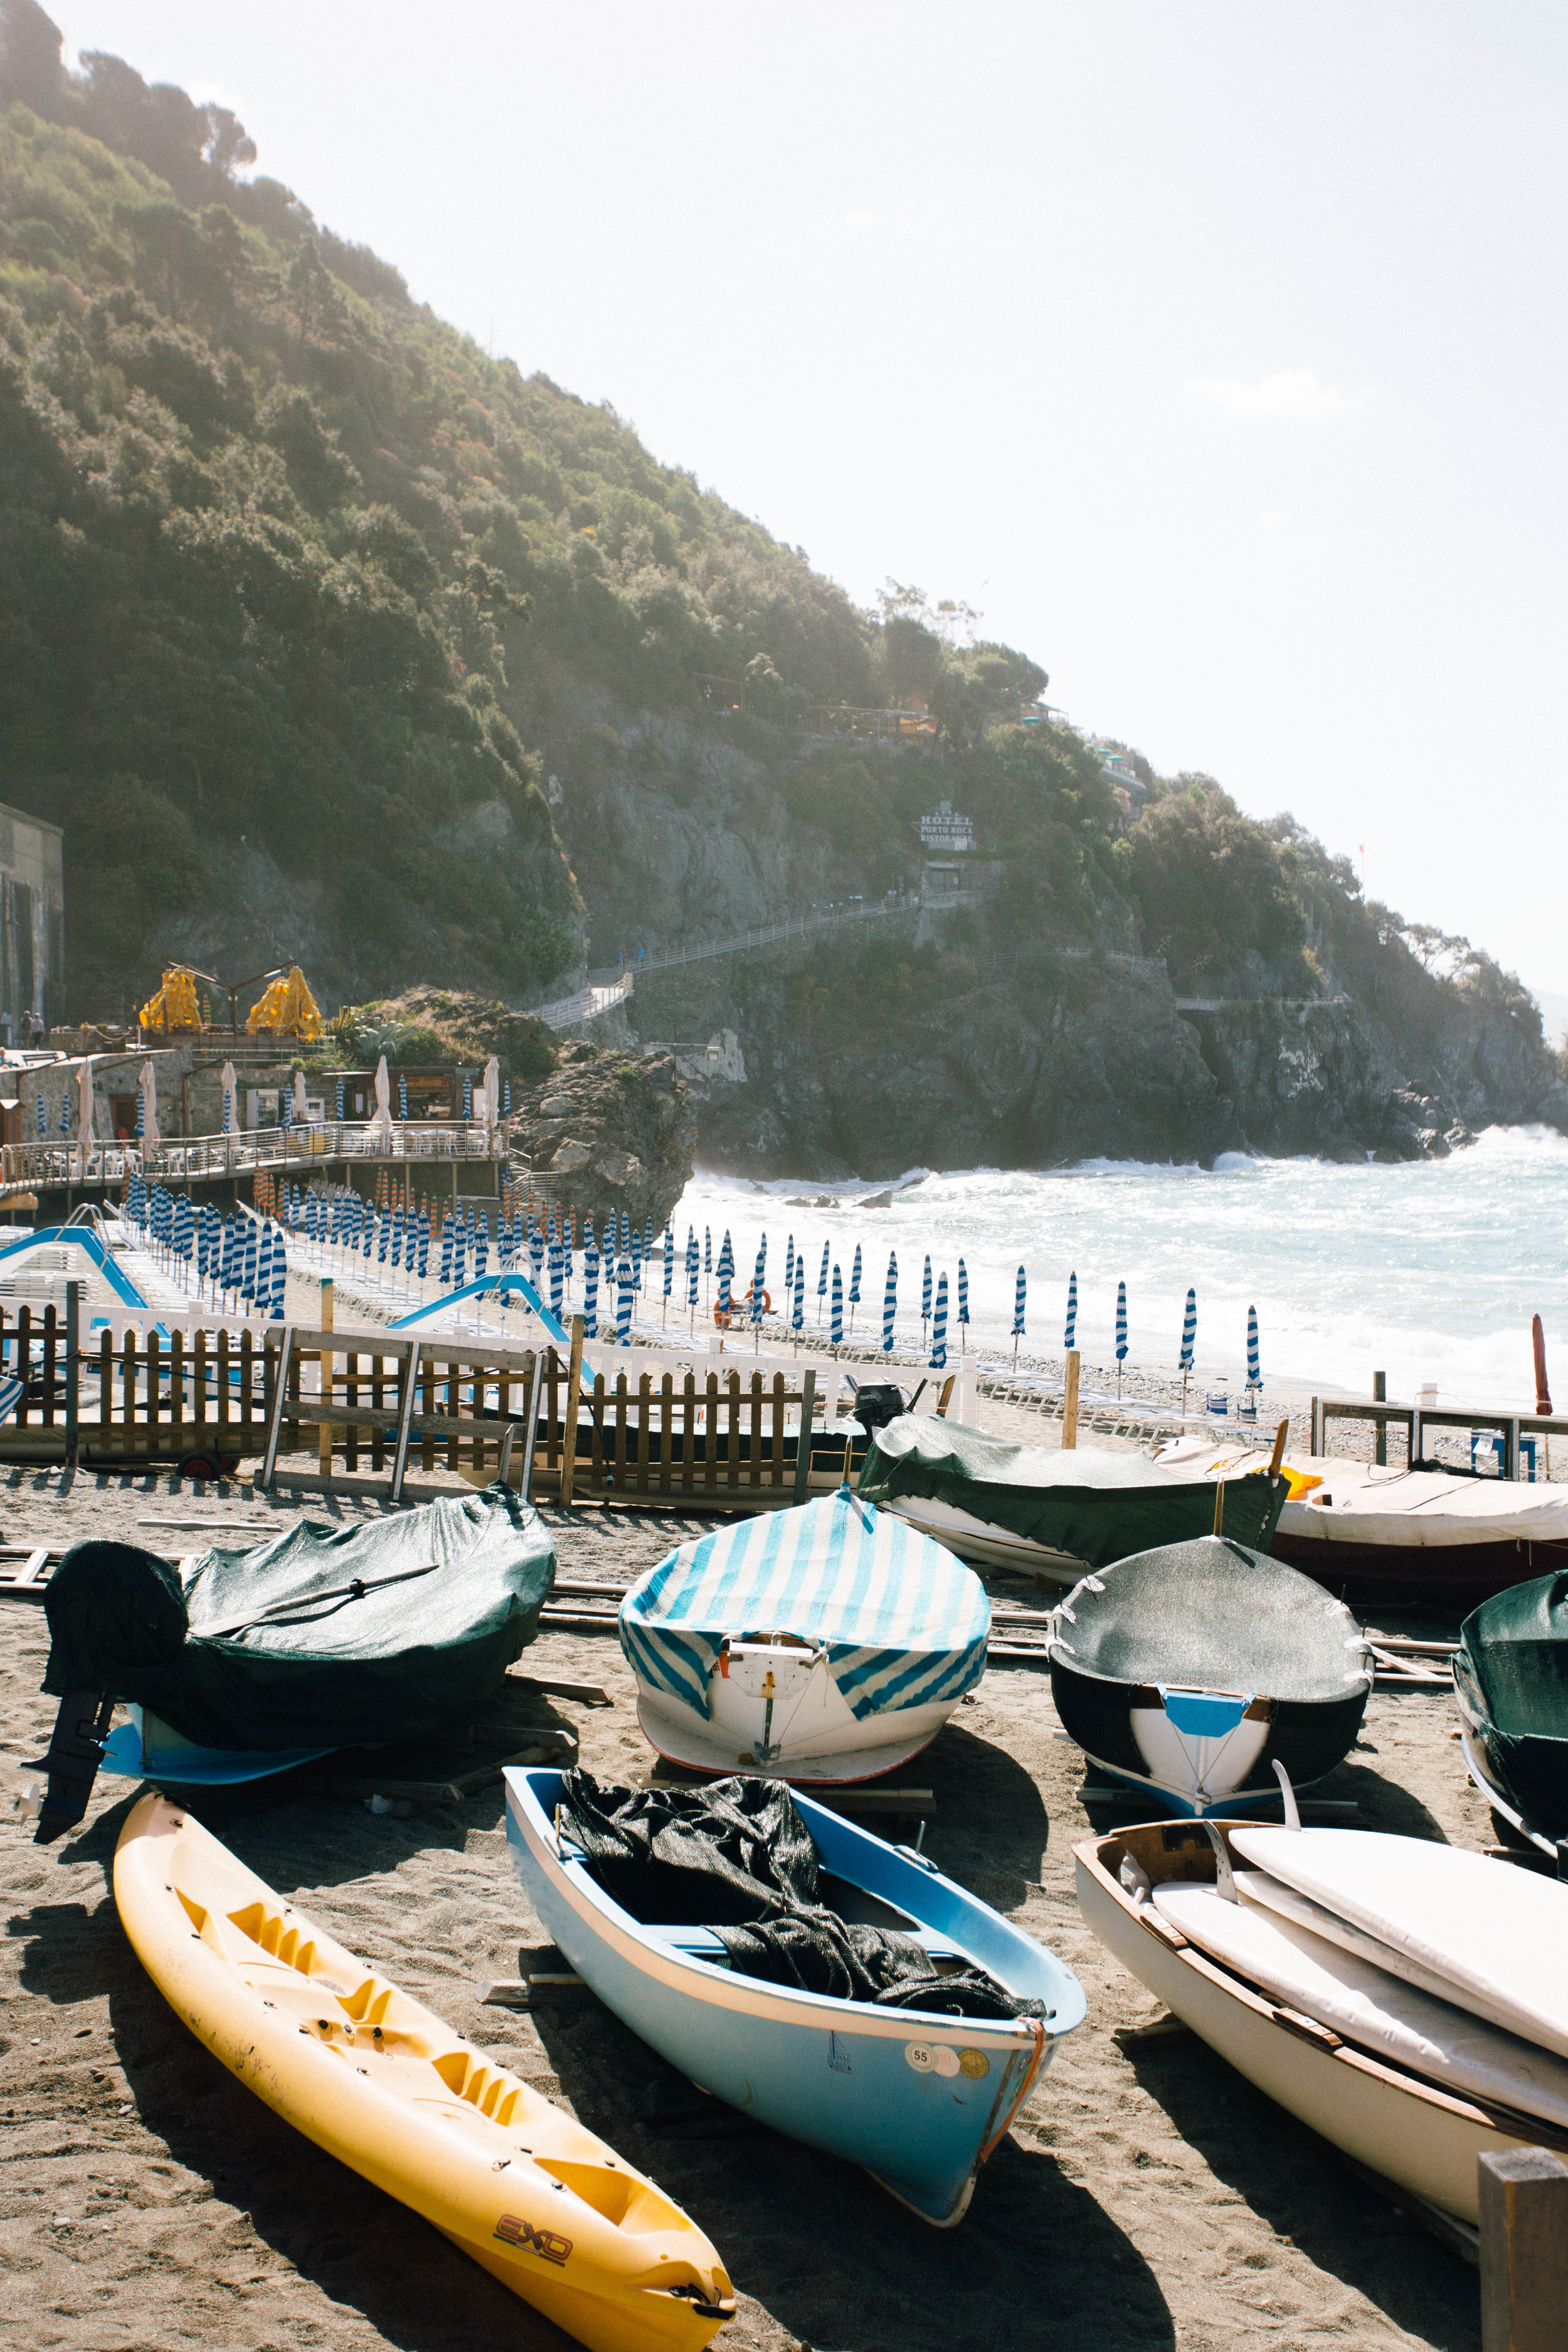 boats-12.jpg